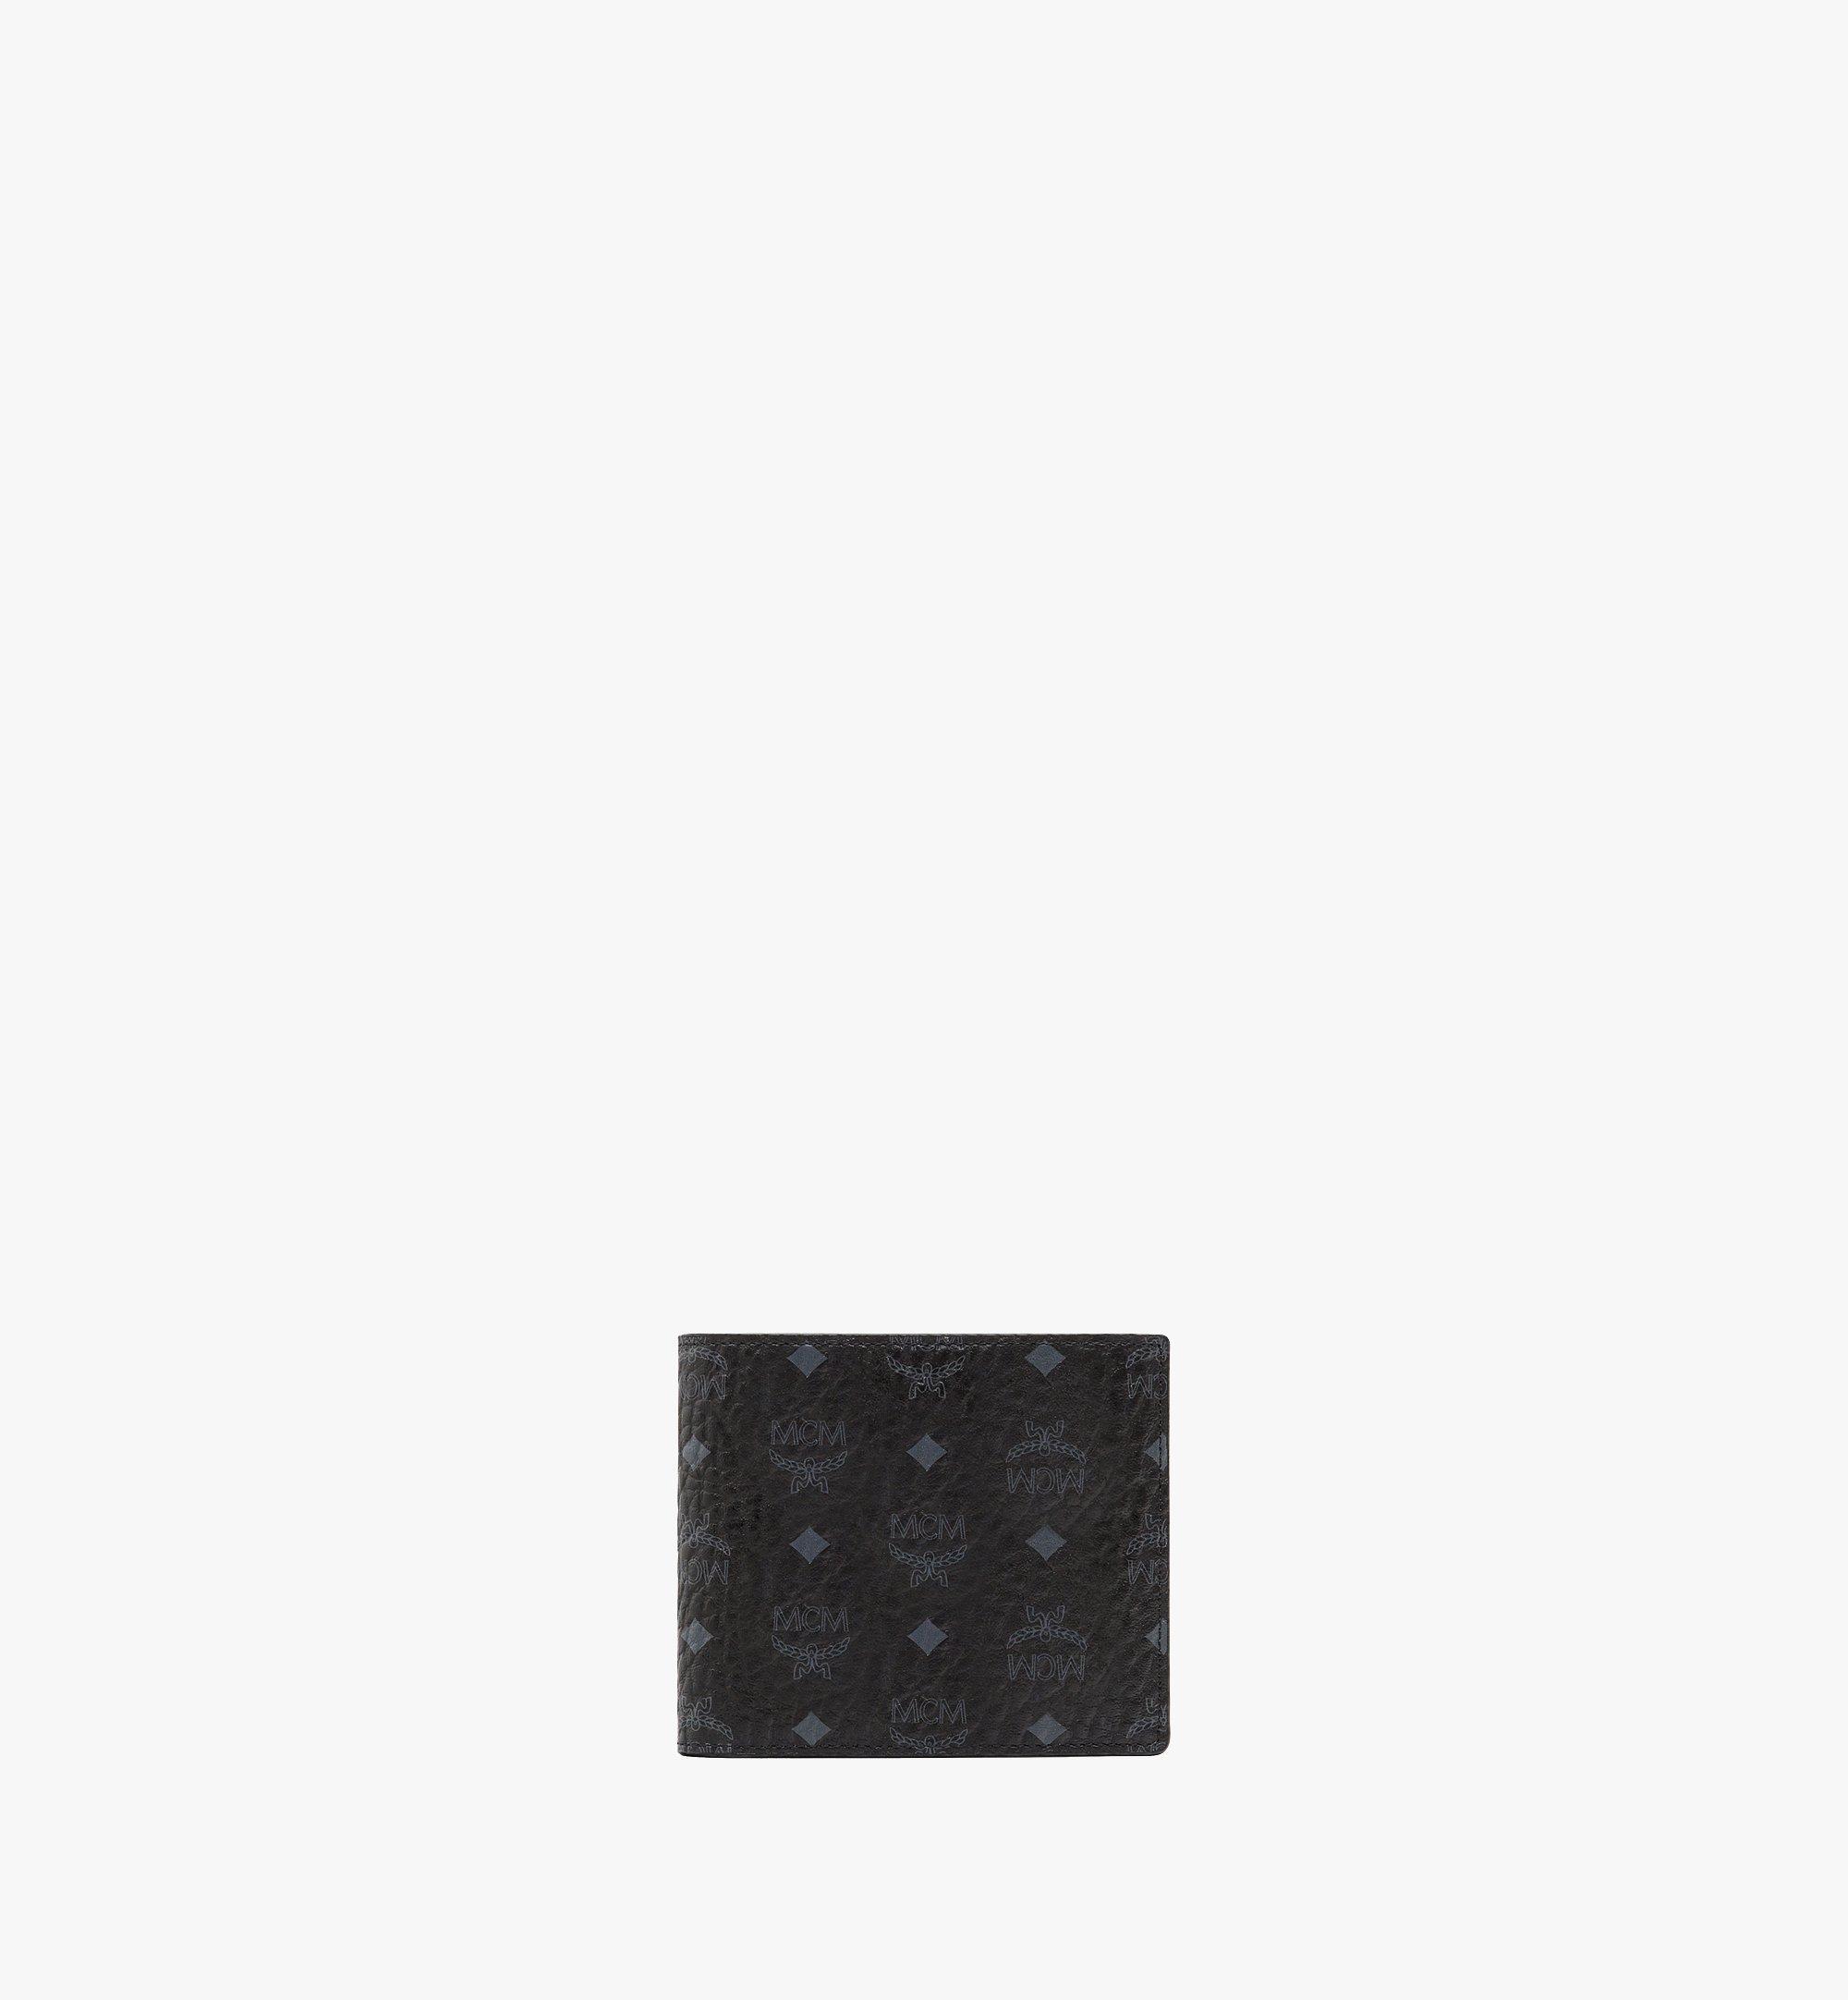 MCM Bifold Wallet w/ Coin Pocket in Visetos Original Black MXSAAVI01BK001 Alternate View 1